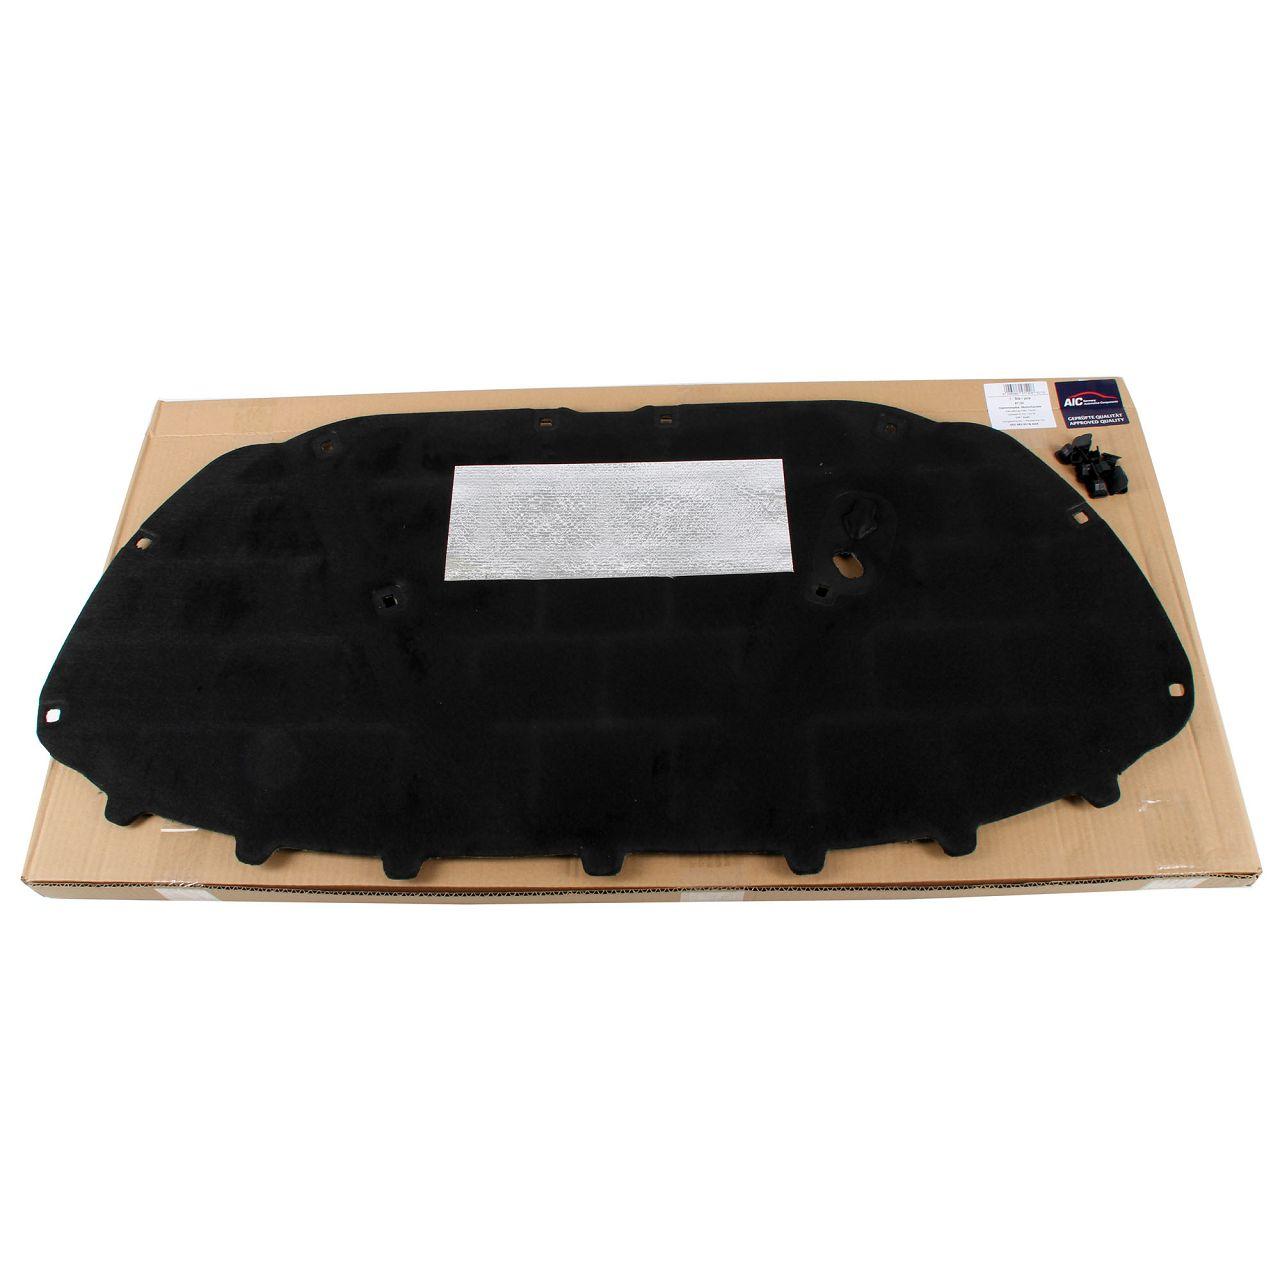 AIC Schalldämmmatte Motorhaubendämmung VW Polo 6R 6C 1.0-2.0 1.2-1.6TDI 6R0863831B